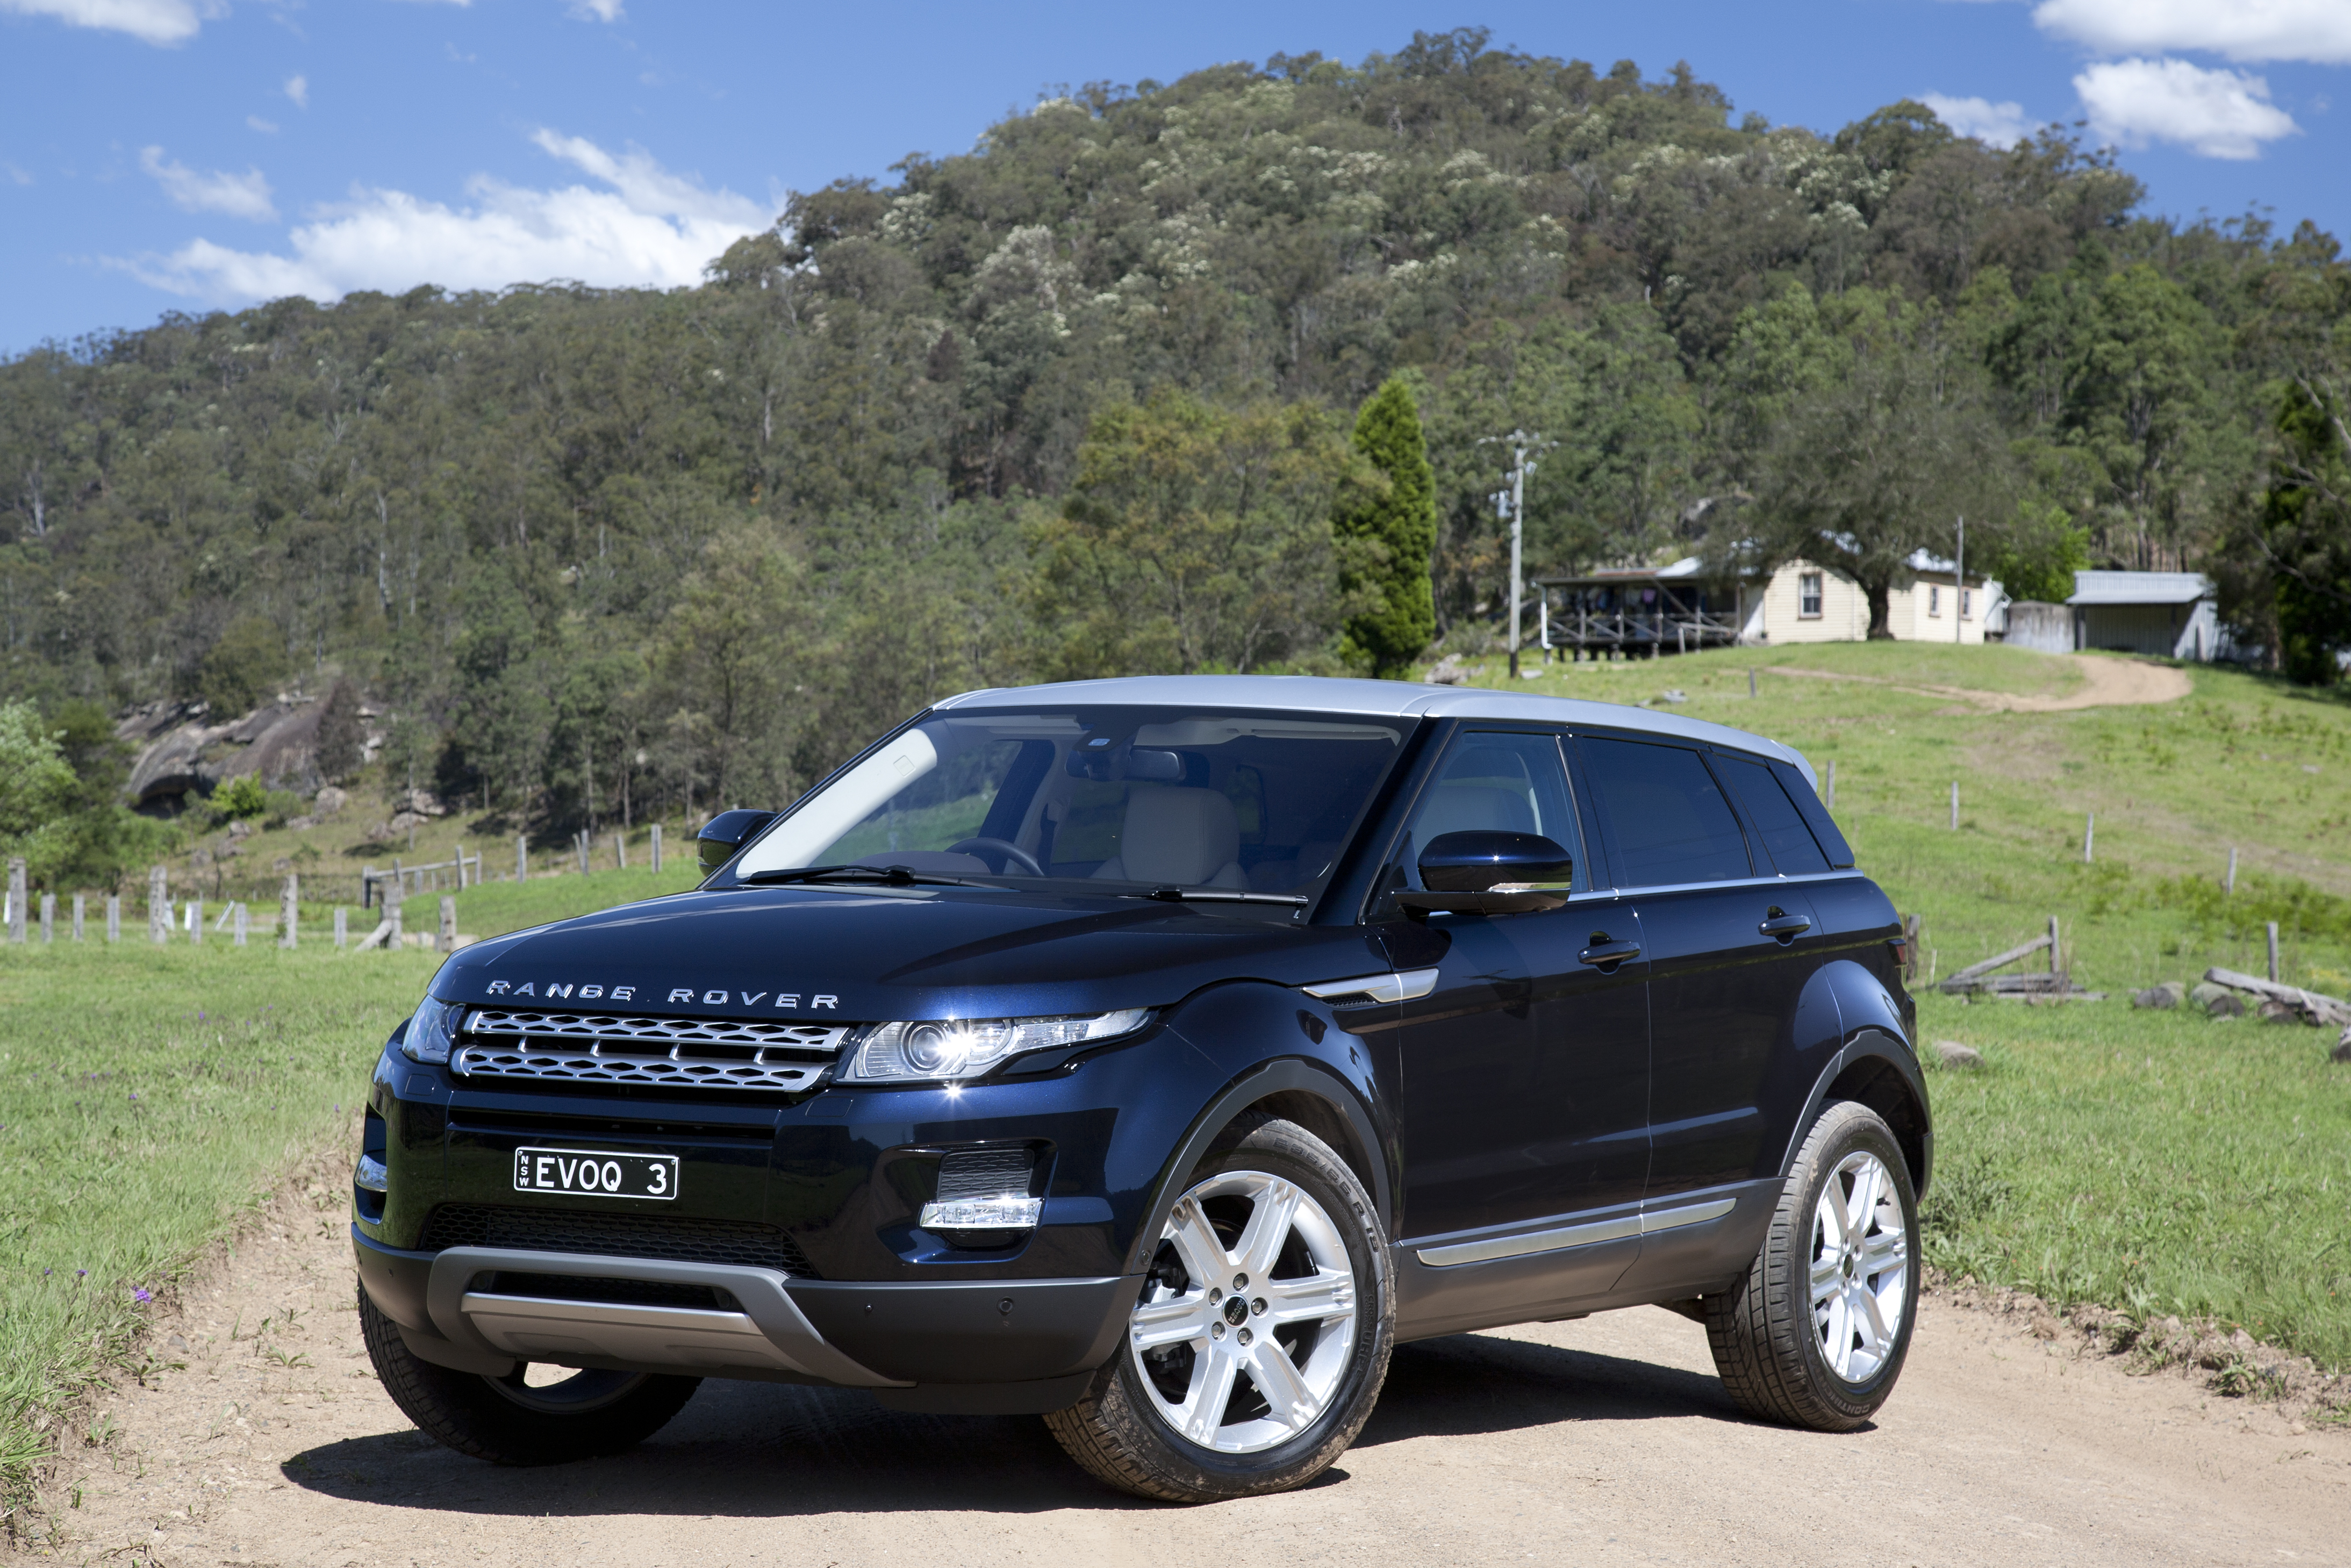 range rover evoque test drive review in sydney image 77254. Black Bedroom Furniture Sets. Home Design Ideas